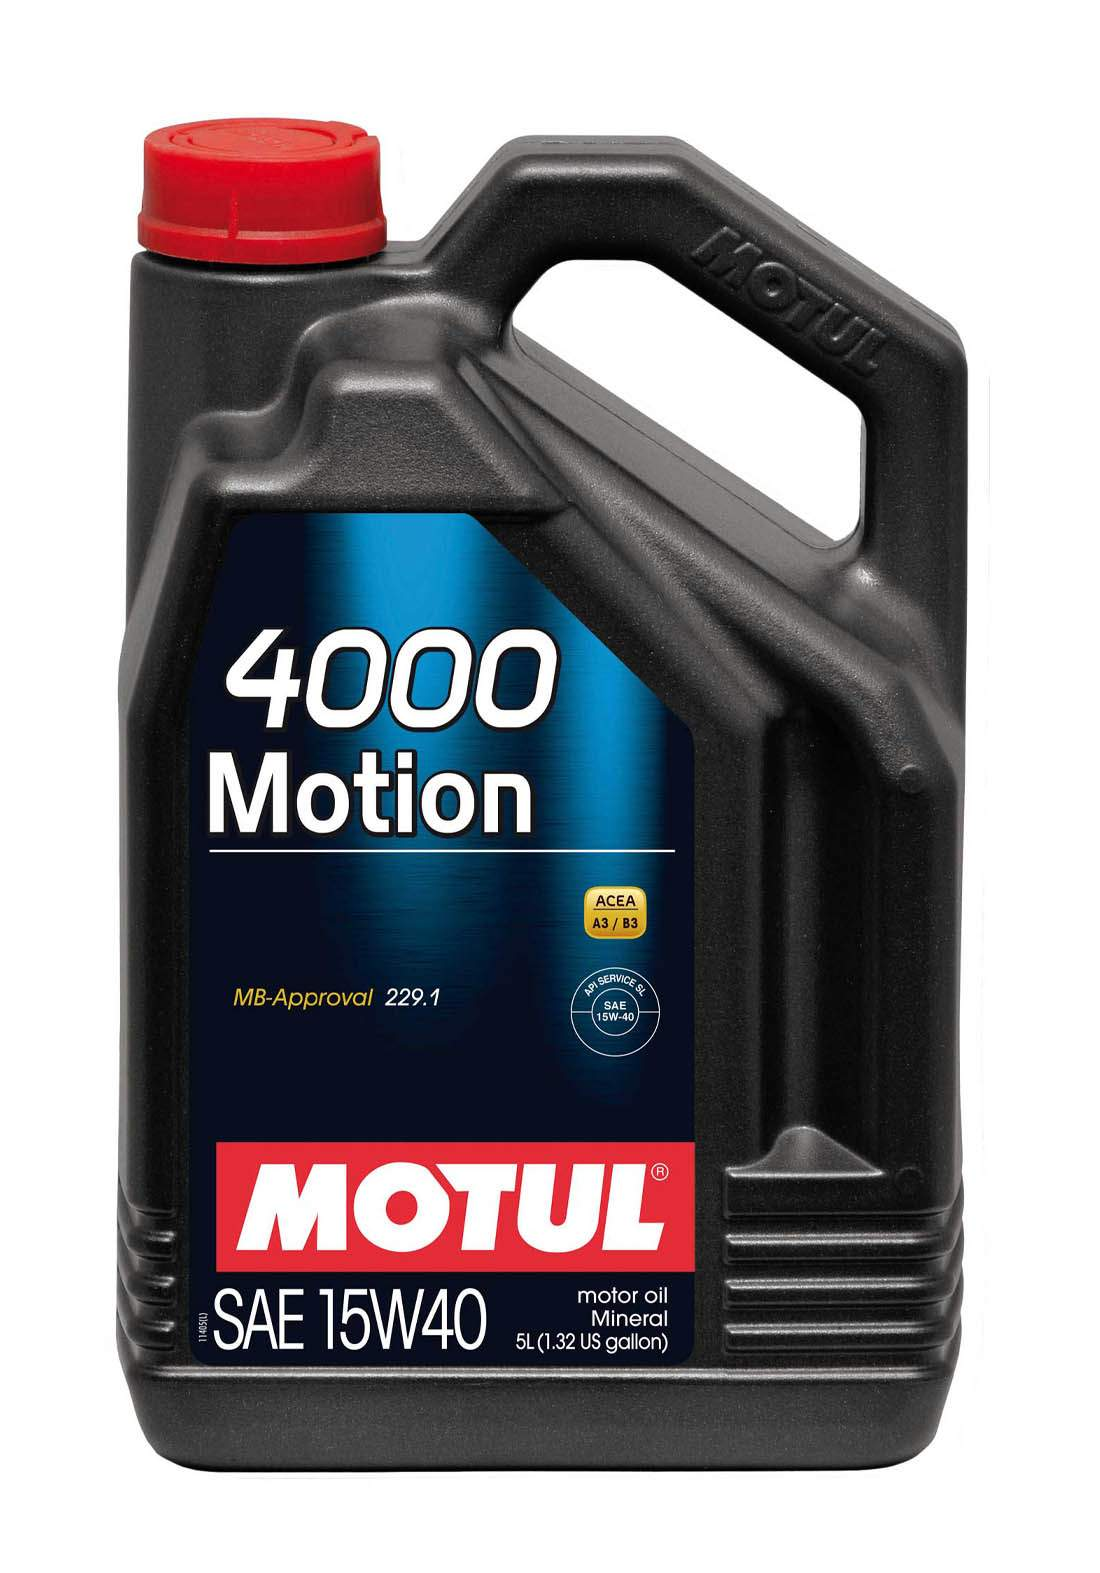 Motul 15w40 4000  Motion Mineral Automotive oil 5L زيت معدني للسيارات